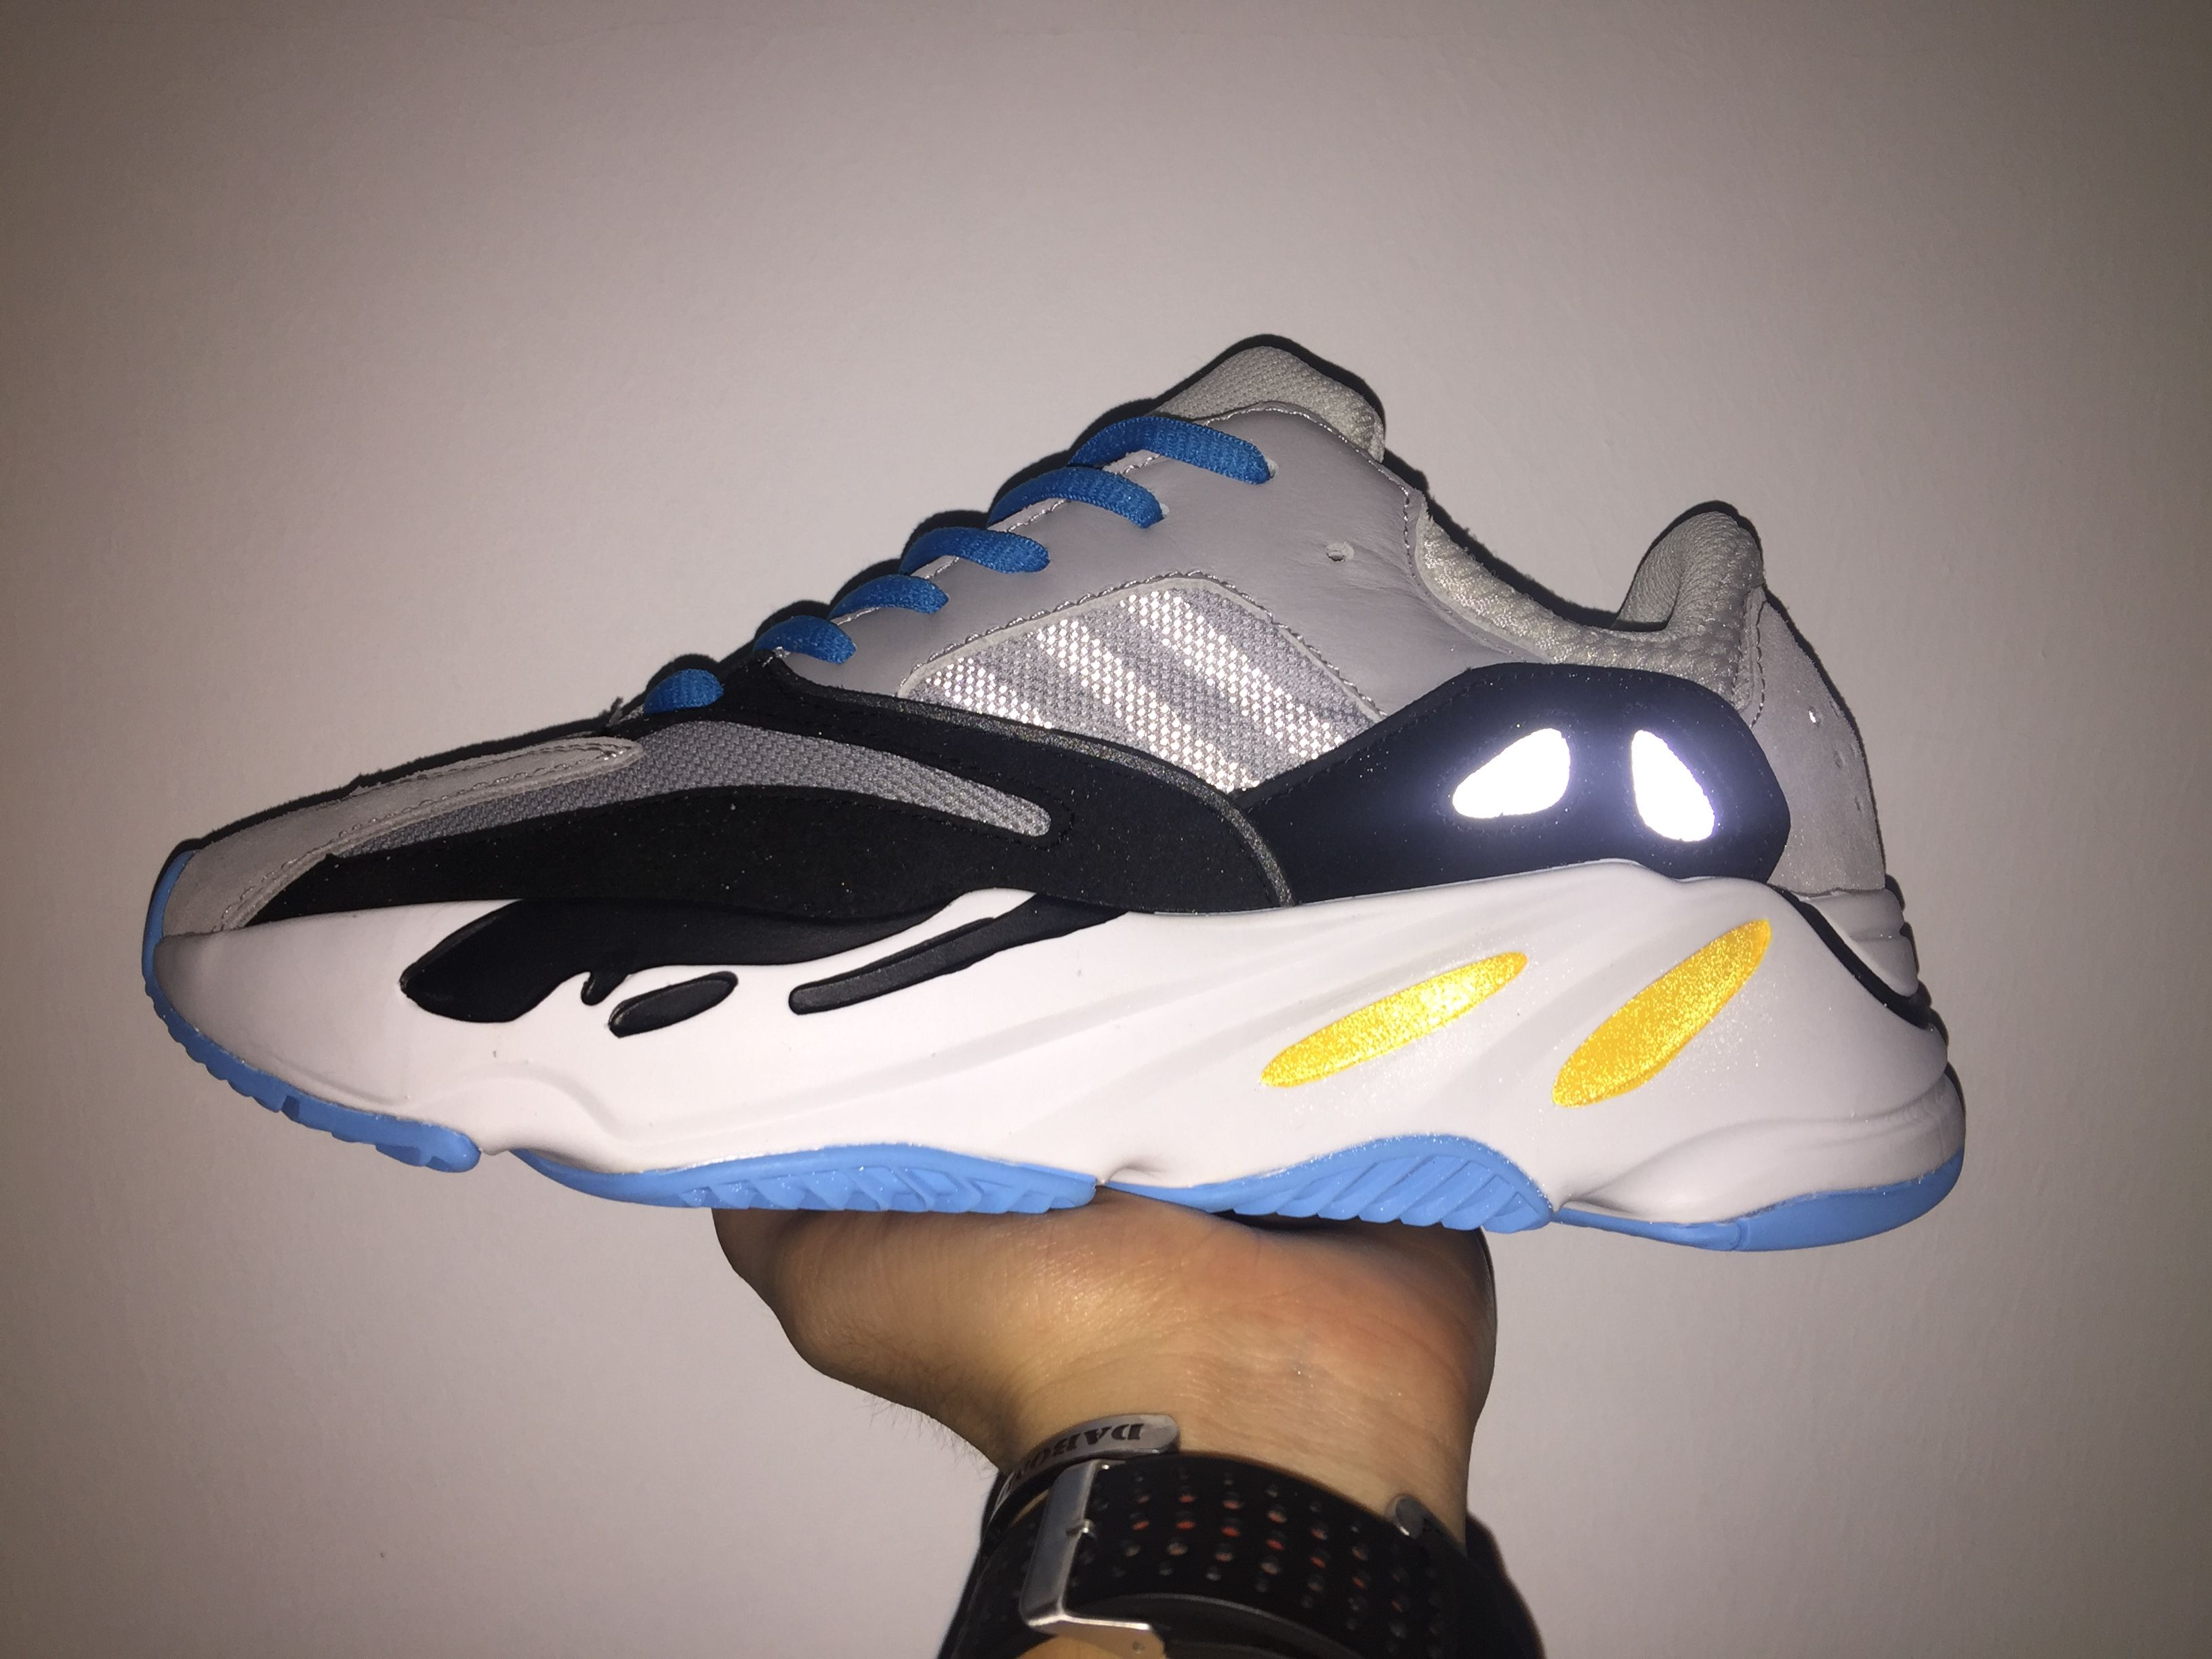 Adidas Yeezy Wave Runner 700 Hot